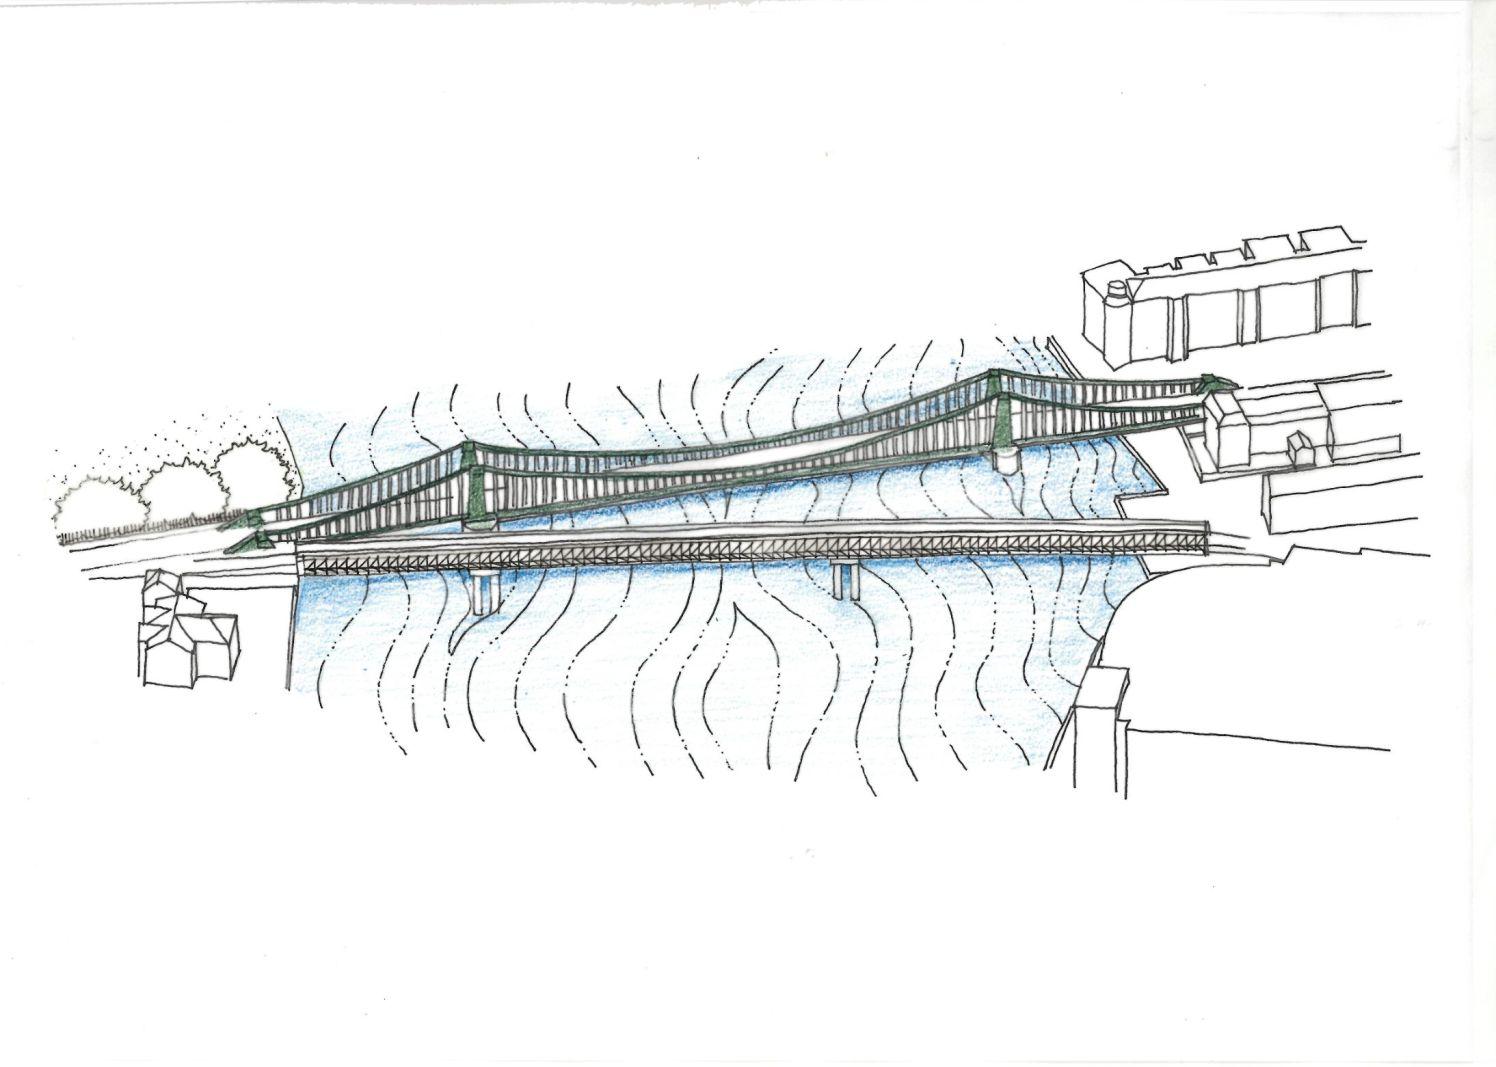 TfL Image - Hammersmith Bridge & Temporary Bridge sketch proposal (1)_web